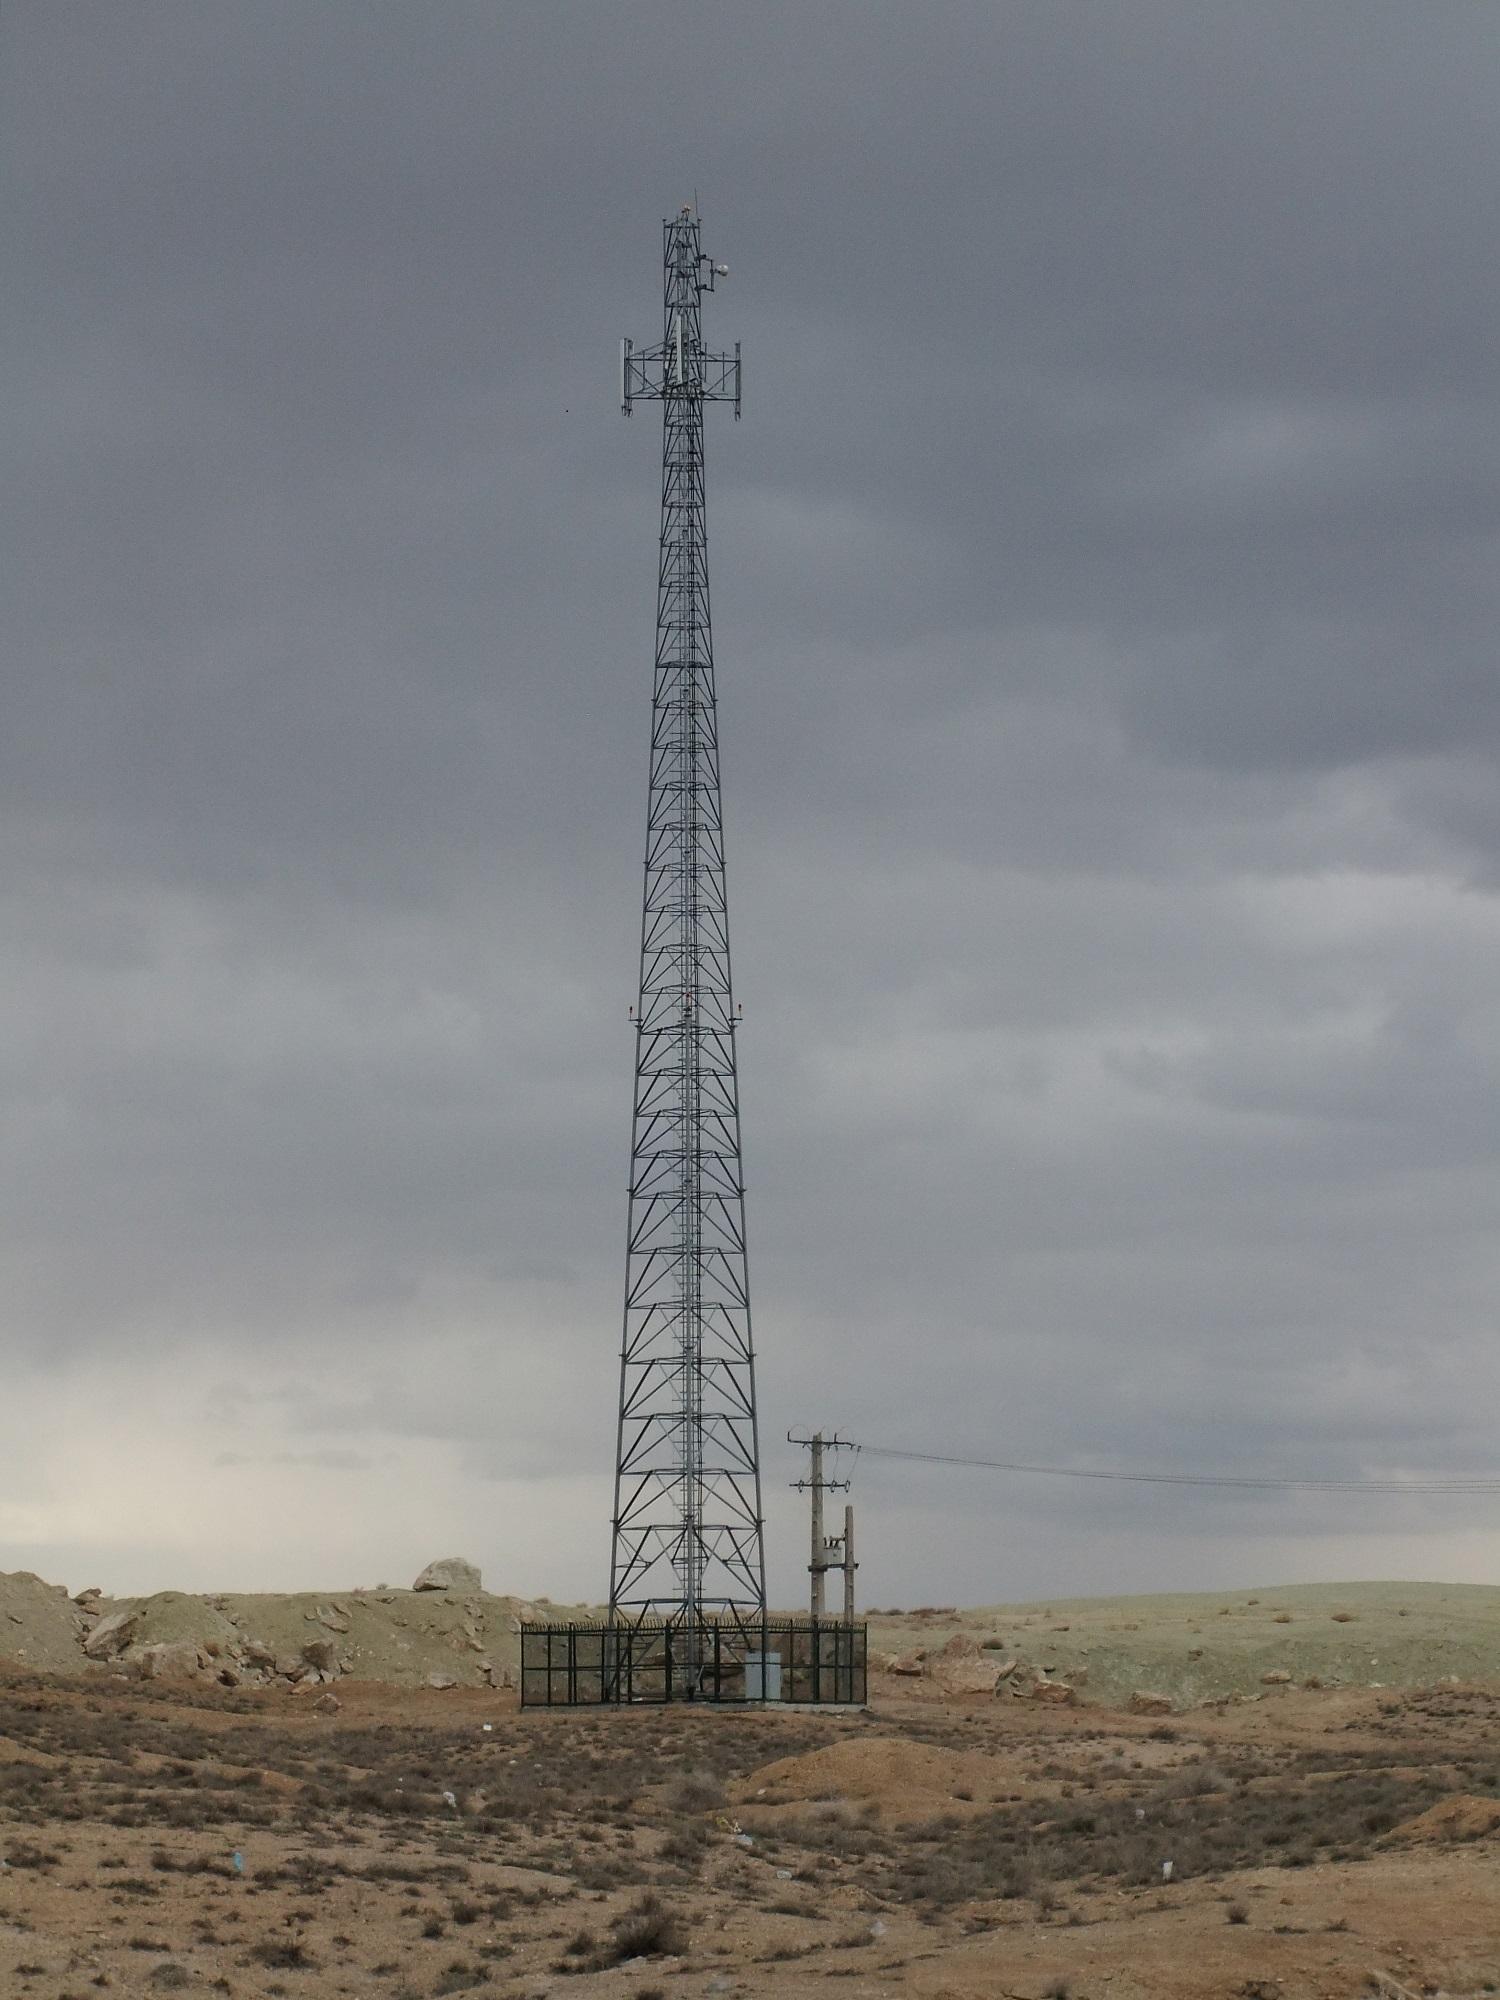 radio_mast_in_the_desert_by_fuguestock.jpg